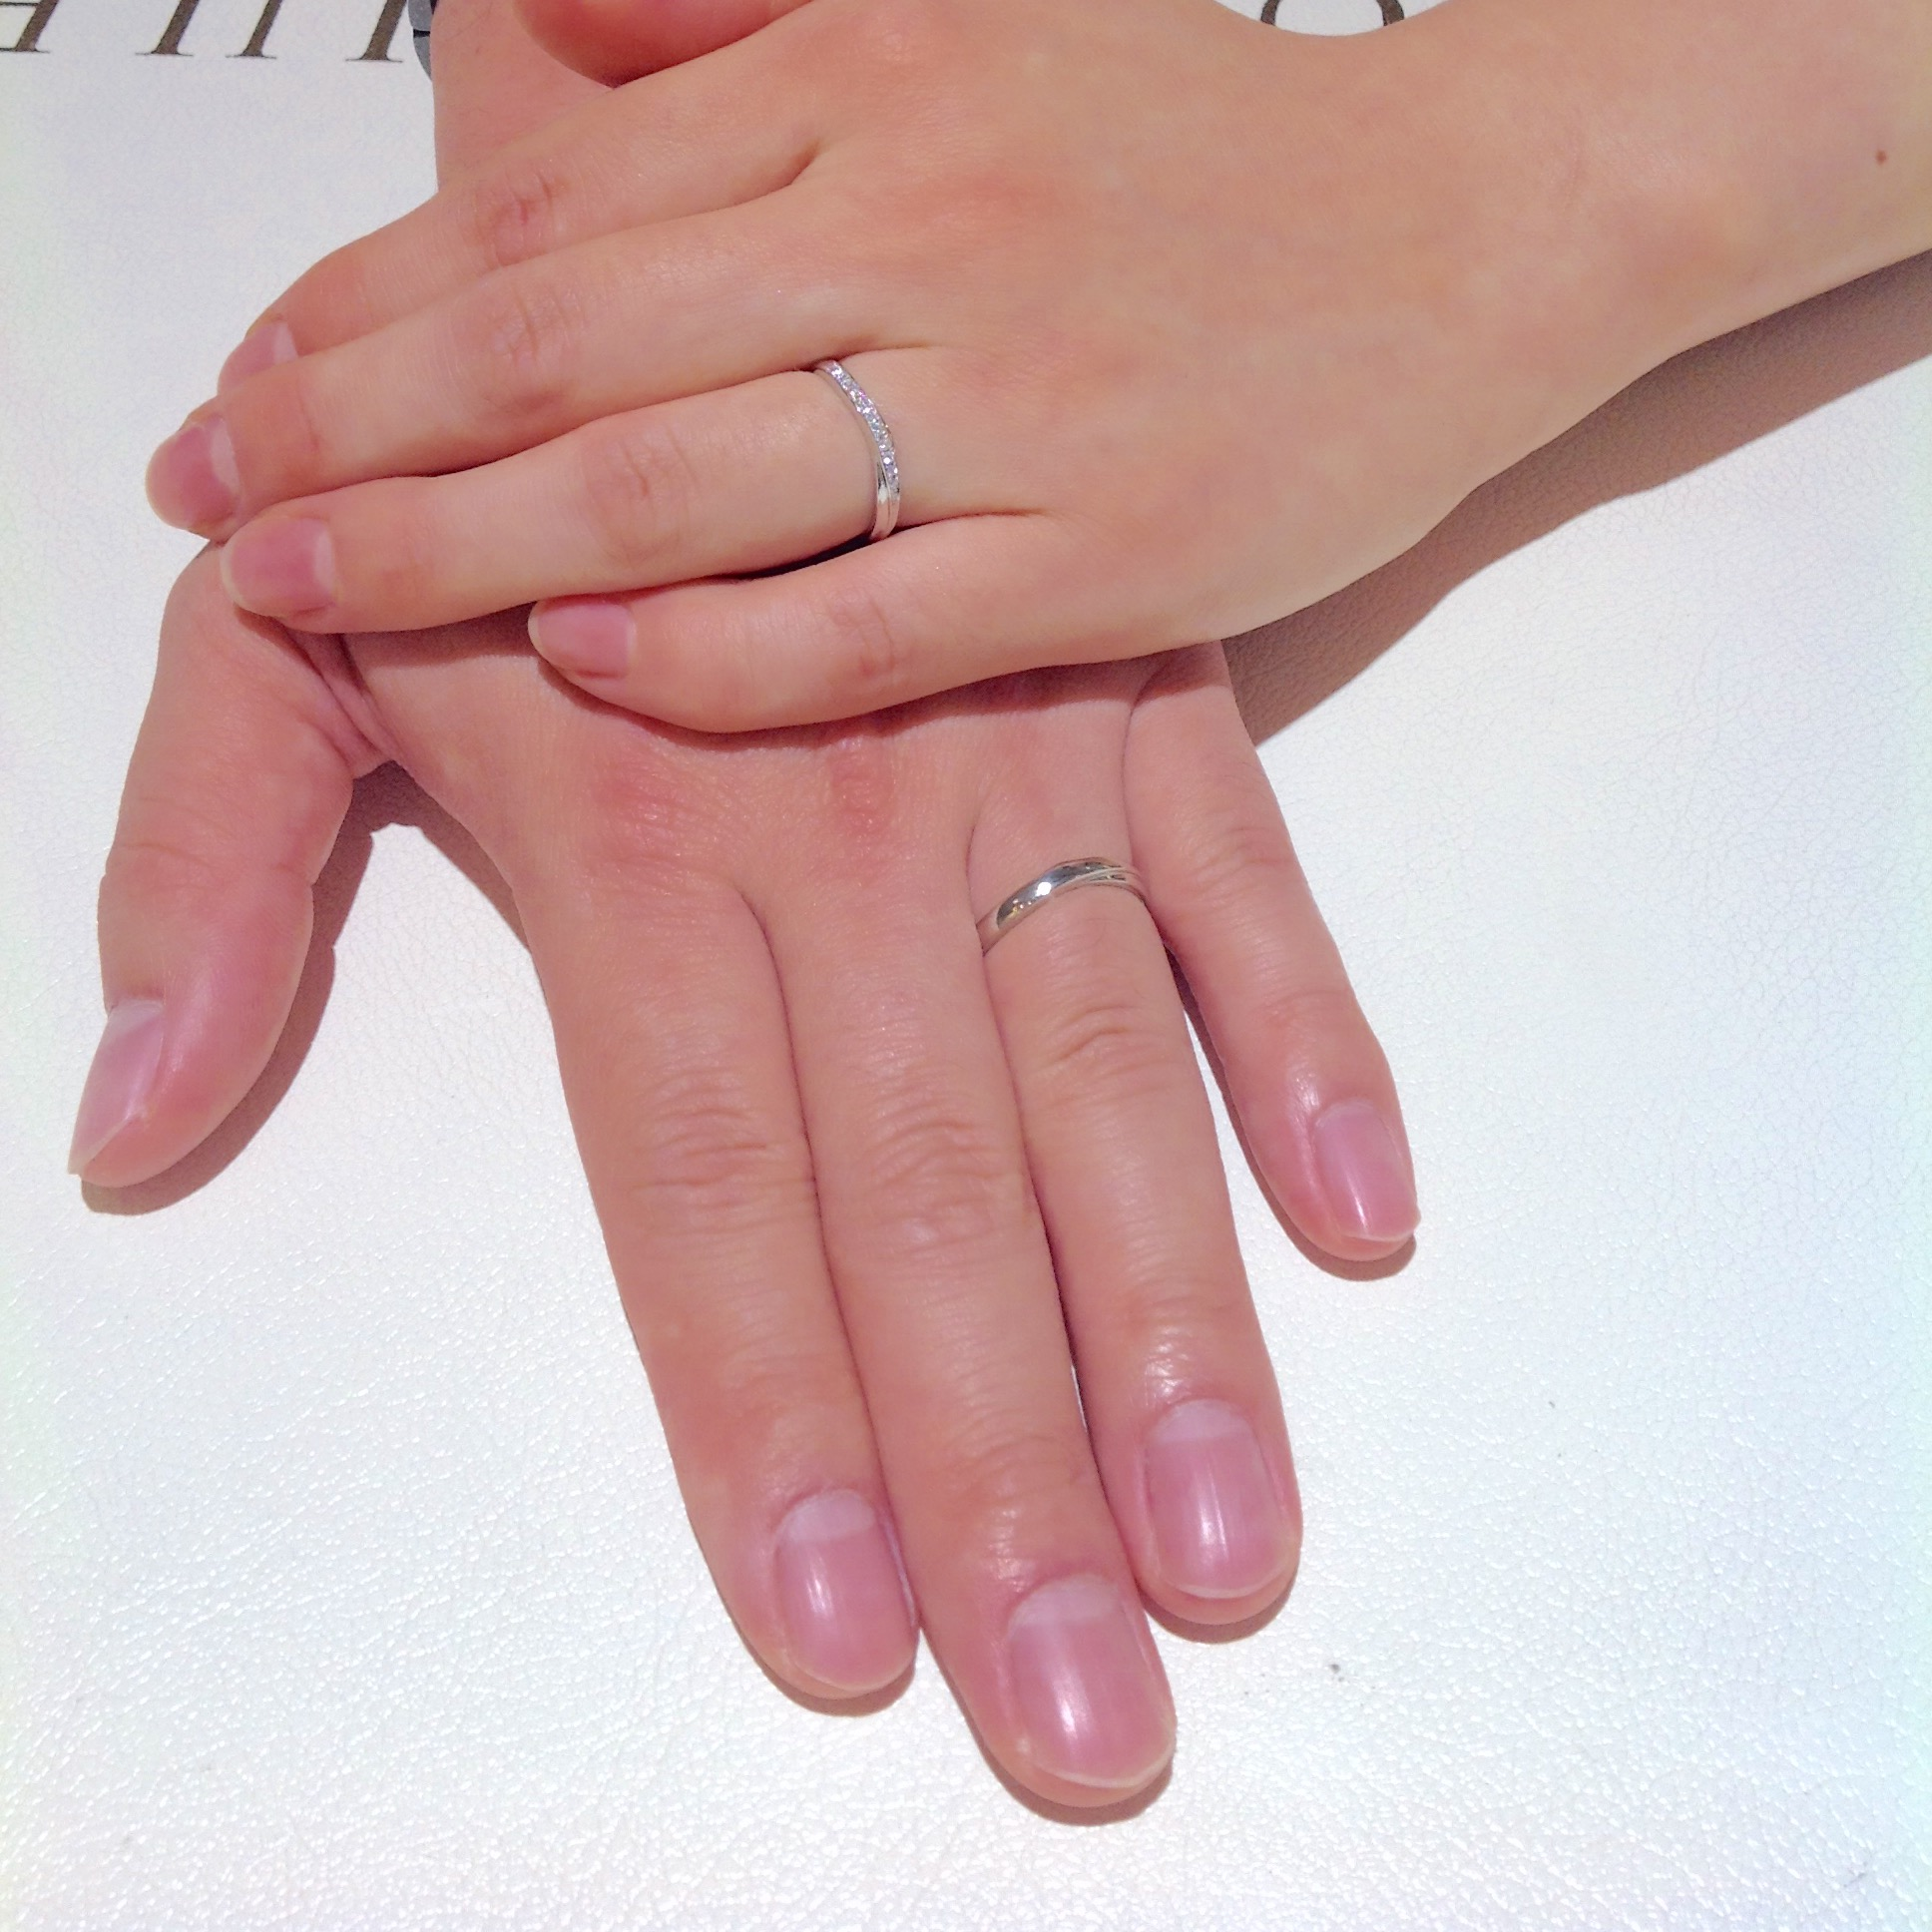 Cafe Ring(カフェリング)の結婚指輪(マリッジリング)をお作り頂きました。